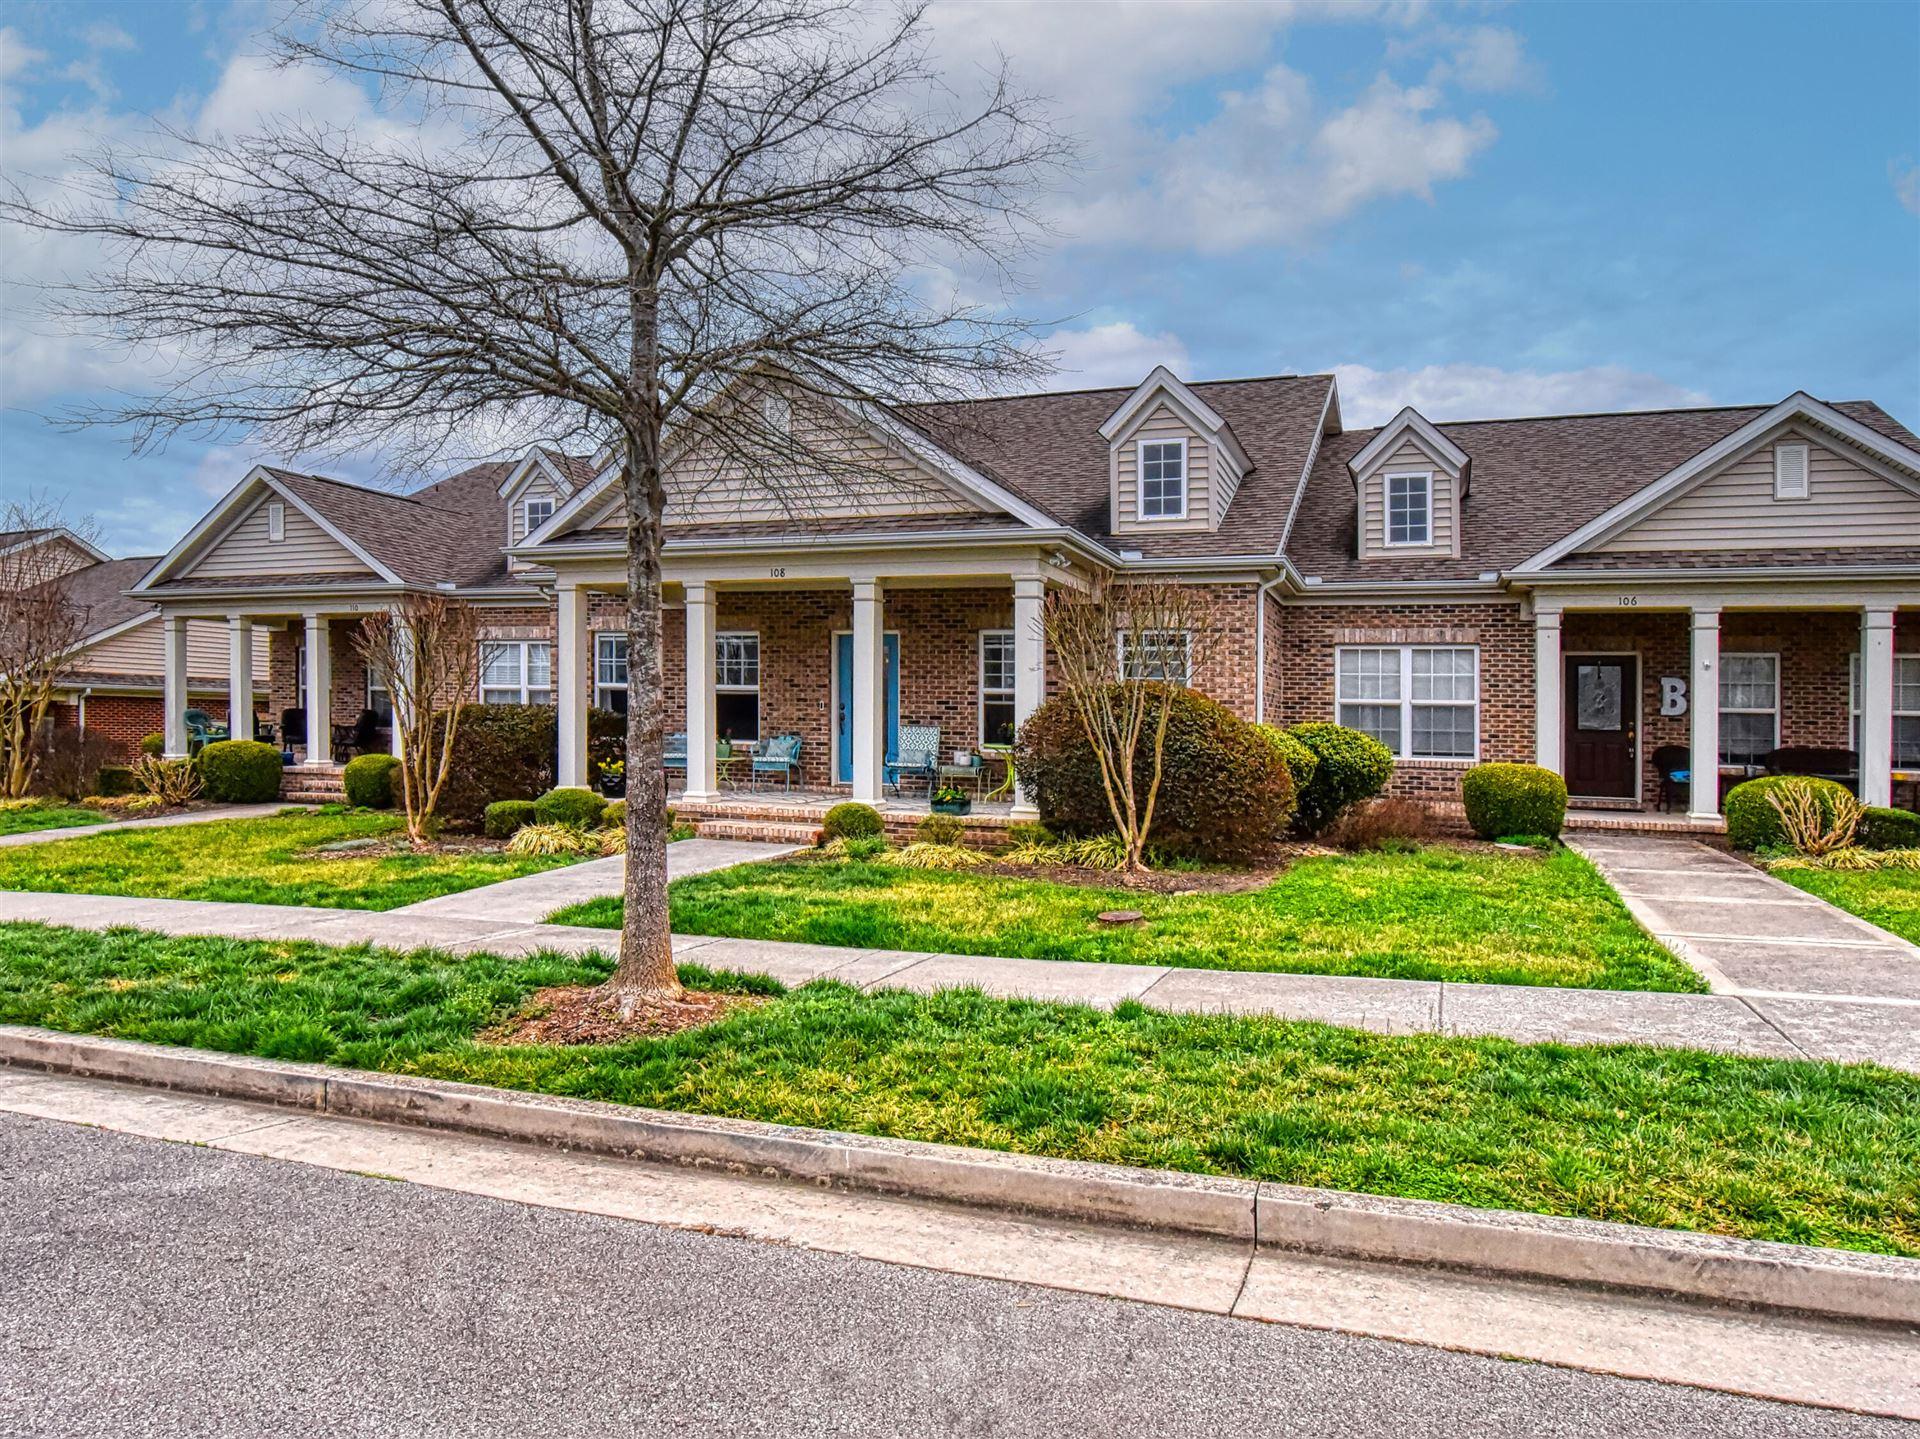 Photo of 108 Hardinberry St, Oak Ridge, TN 37830 (MLS # 1155941)